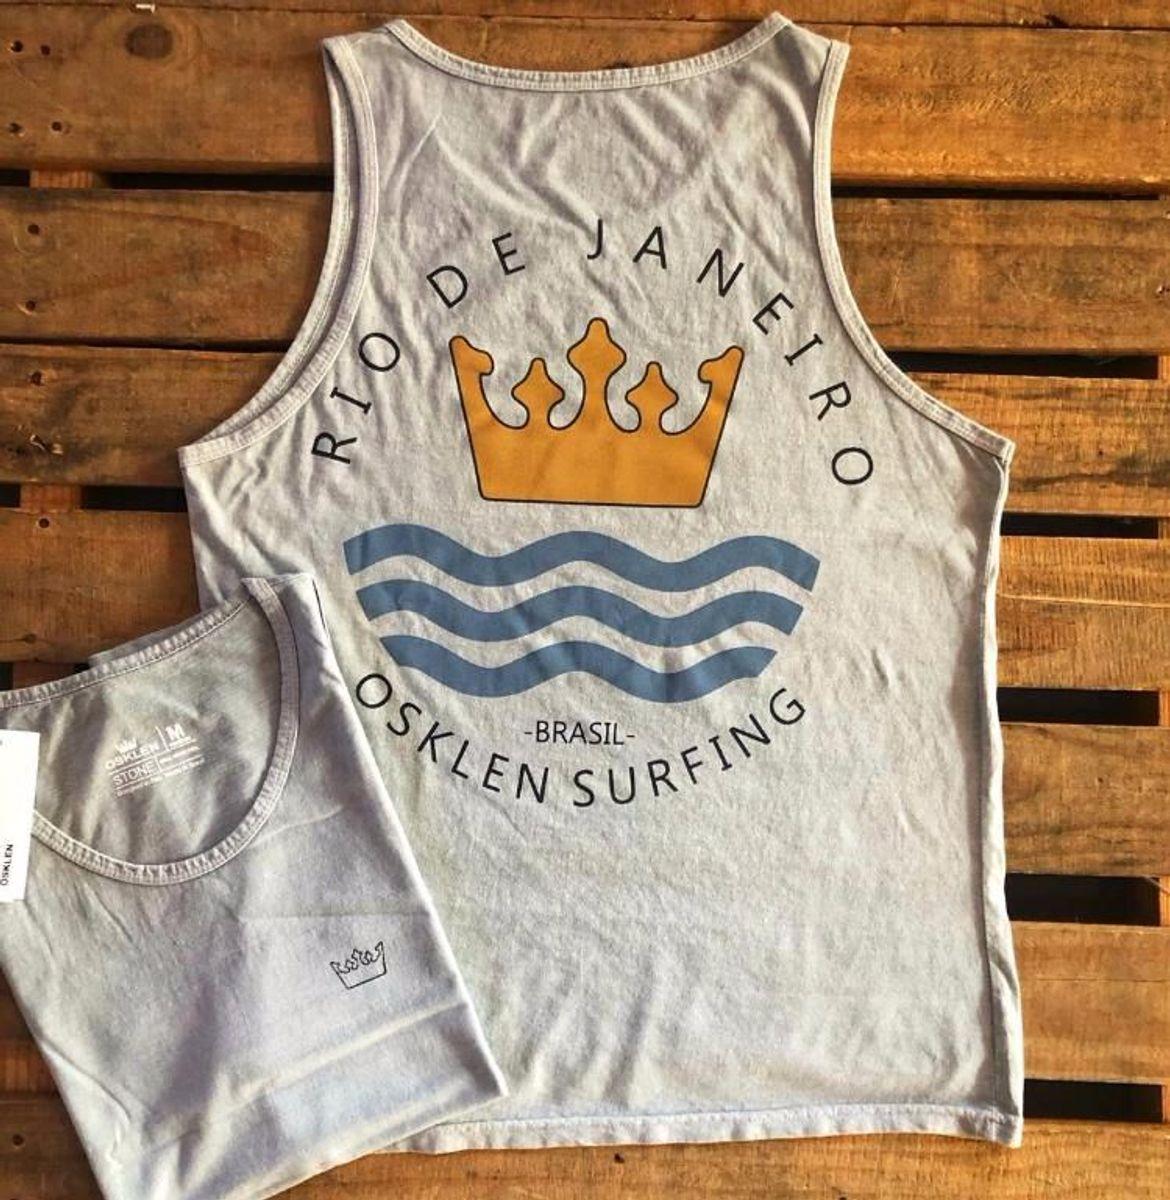 76f51e217c Camiseta Regata Osklen Surfing Cinza Tam.p